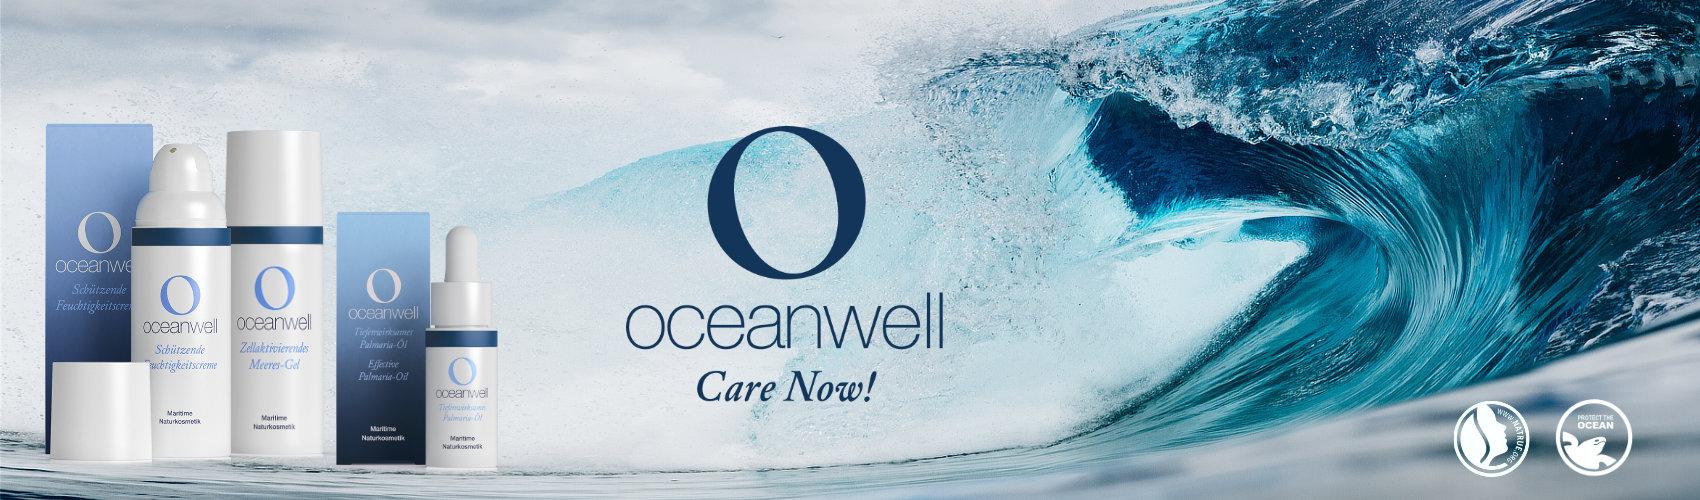 Oceanwell Summer 2021